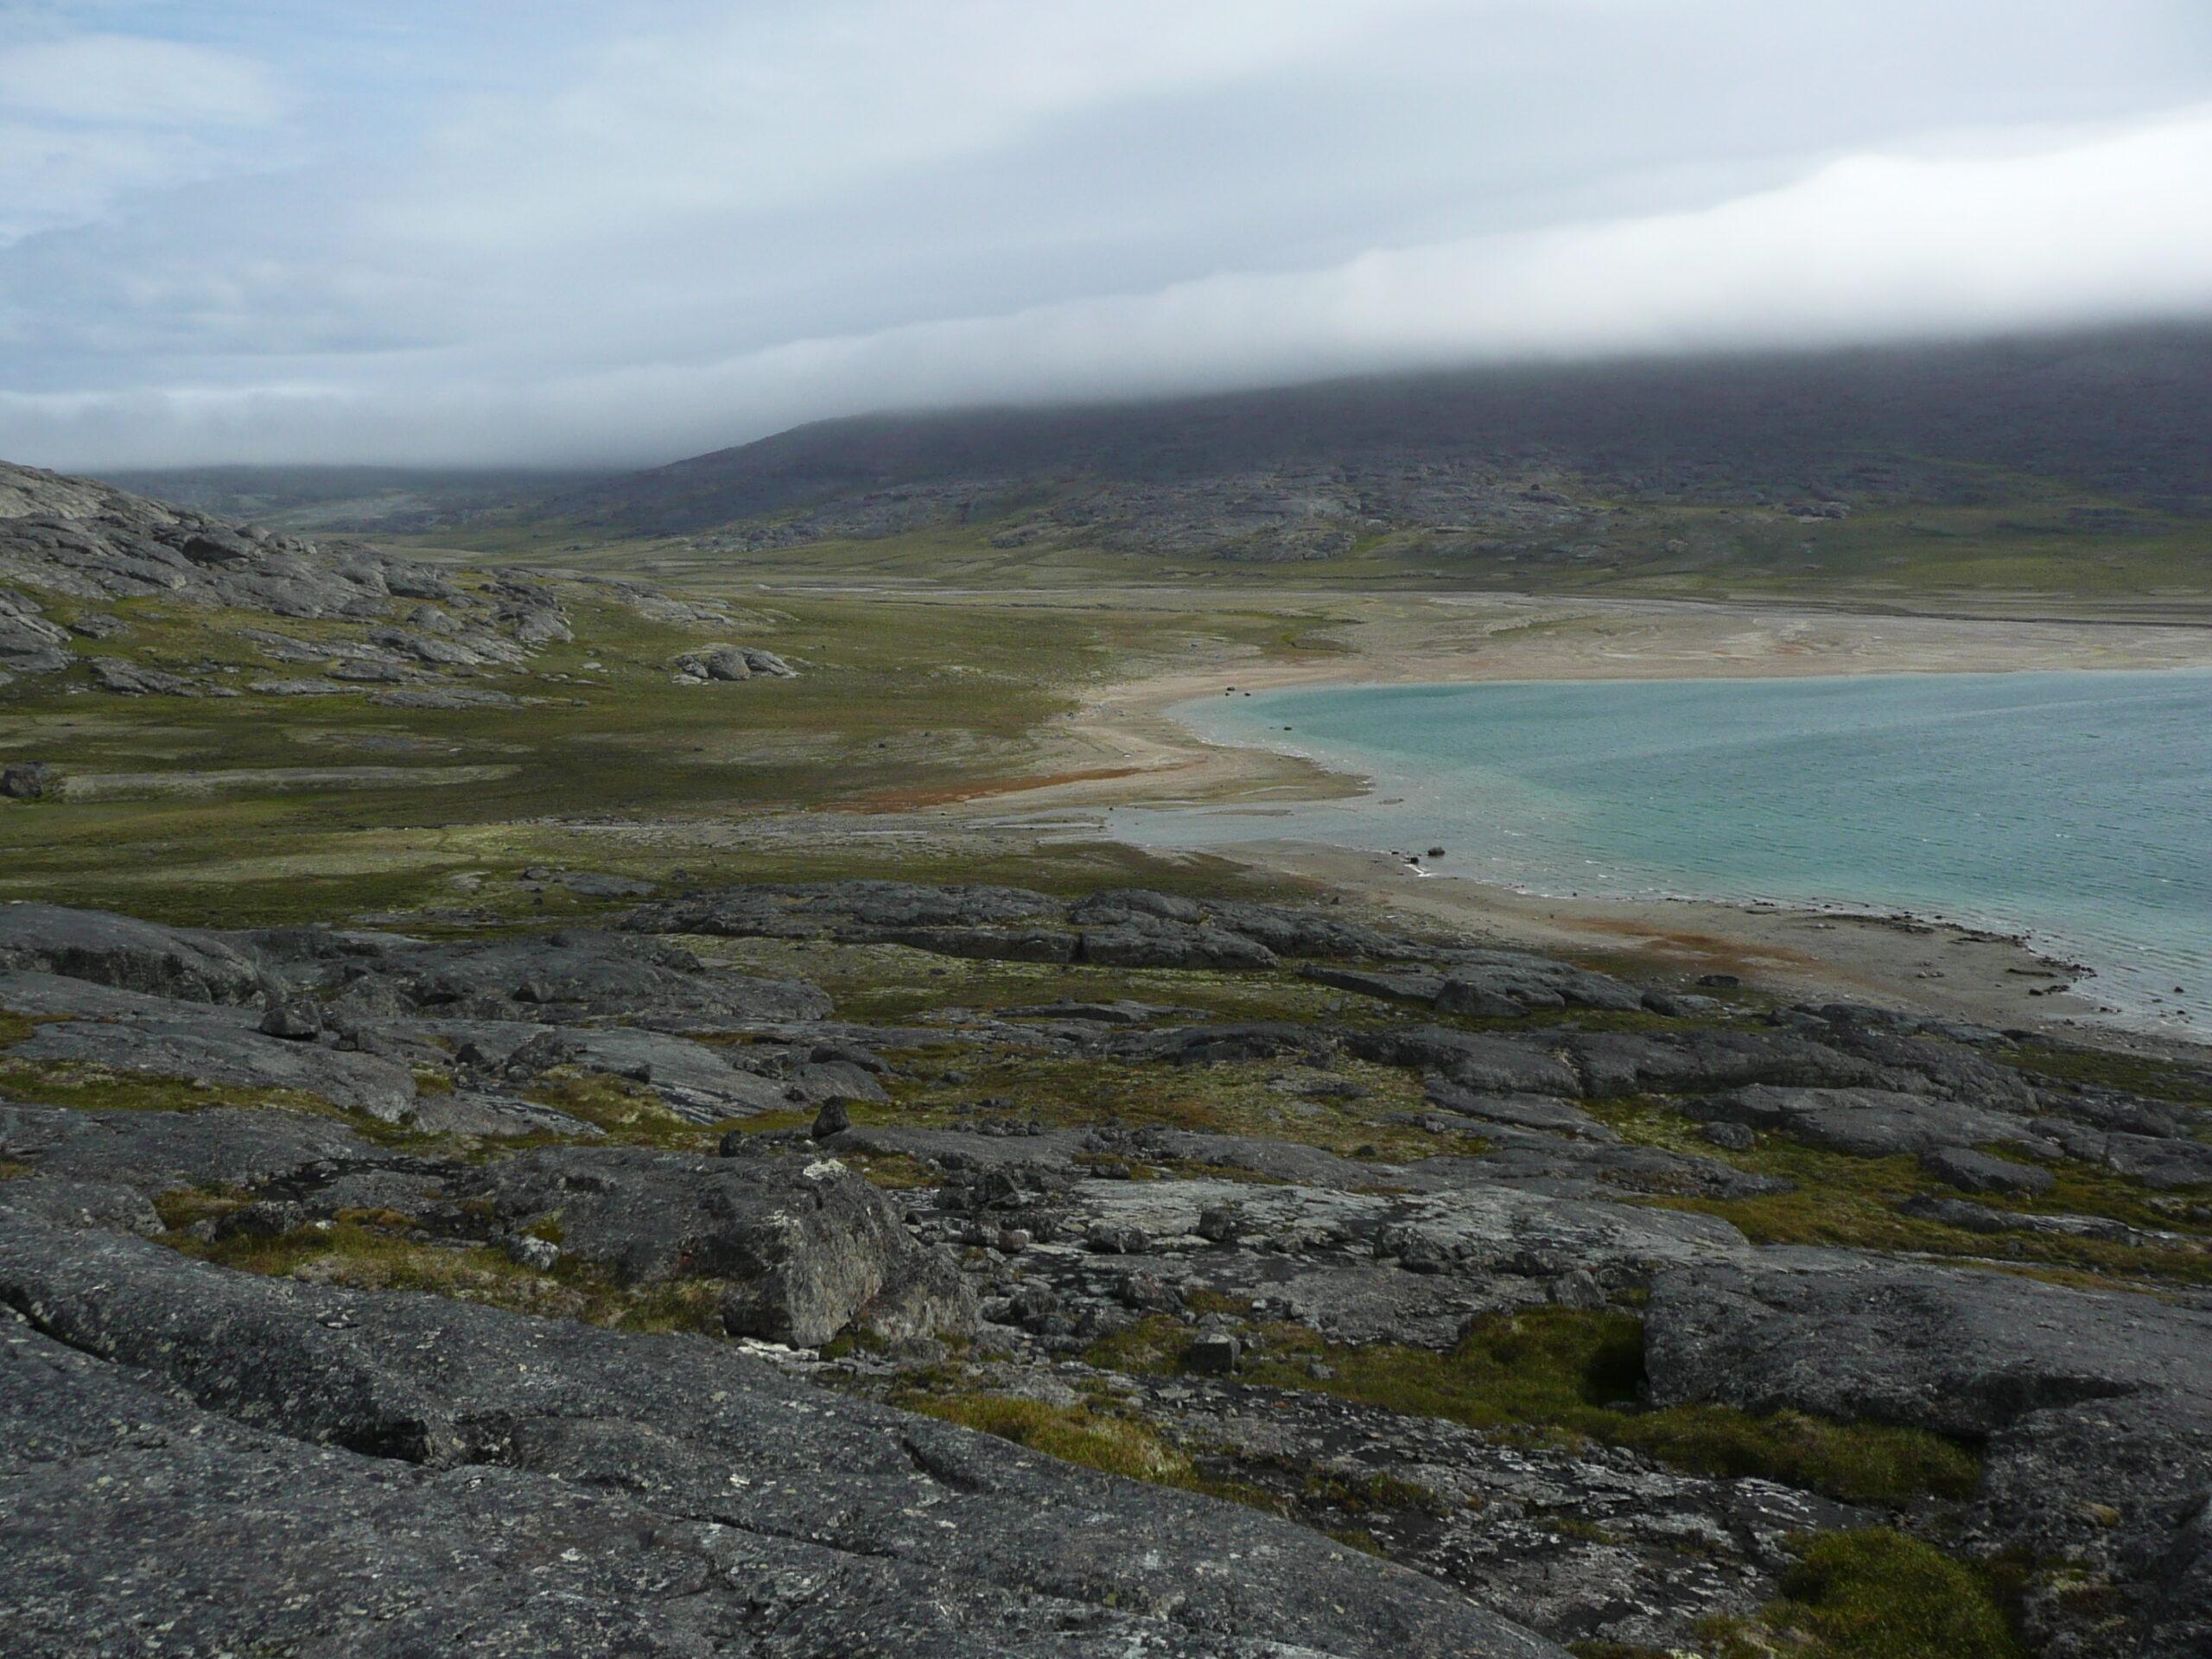 Landscape on one of the Arqvilliit islands Yvan Pouliot Arqvilliit IPCA Steering Committee